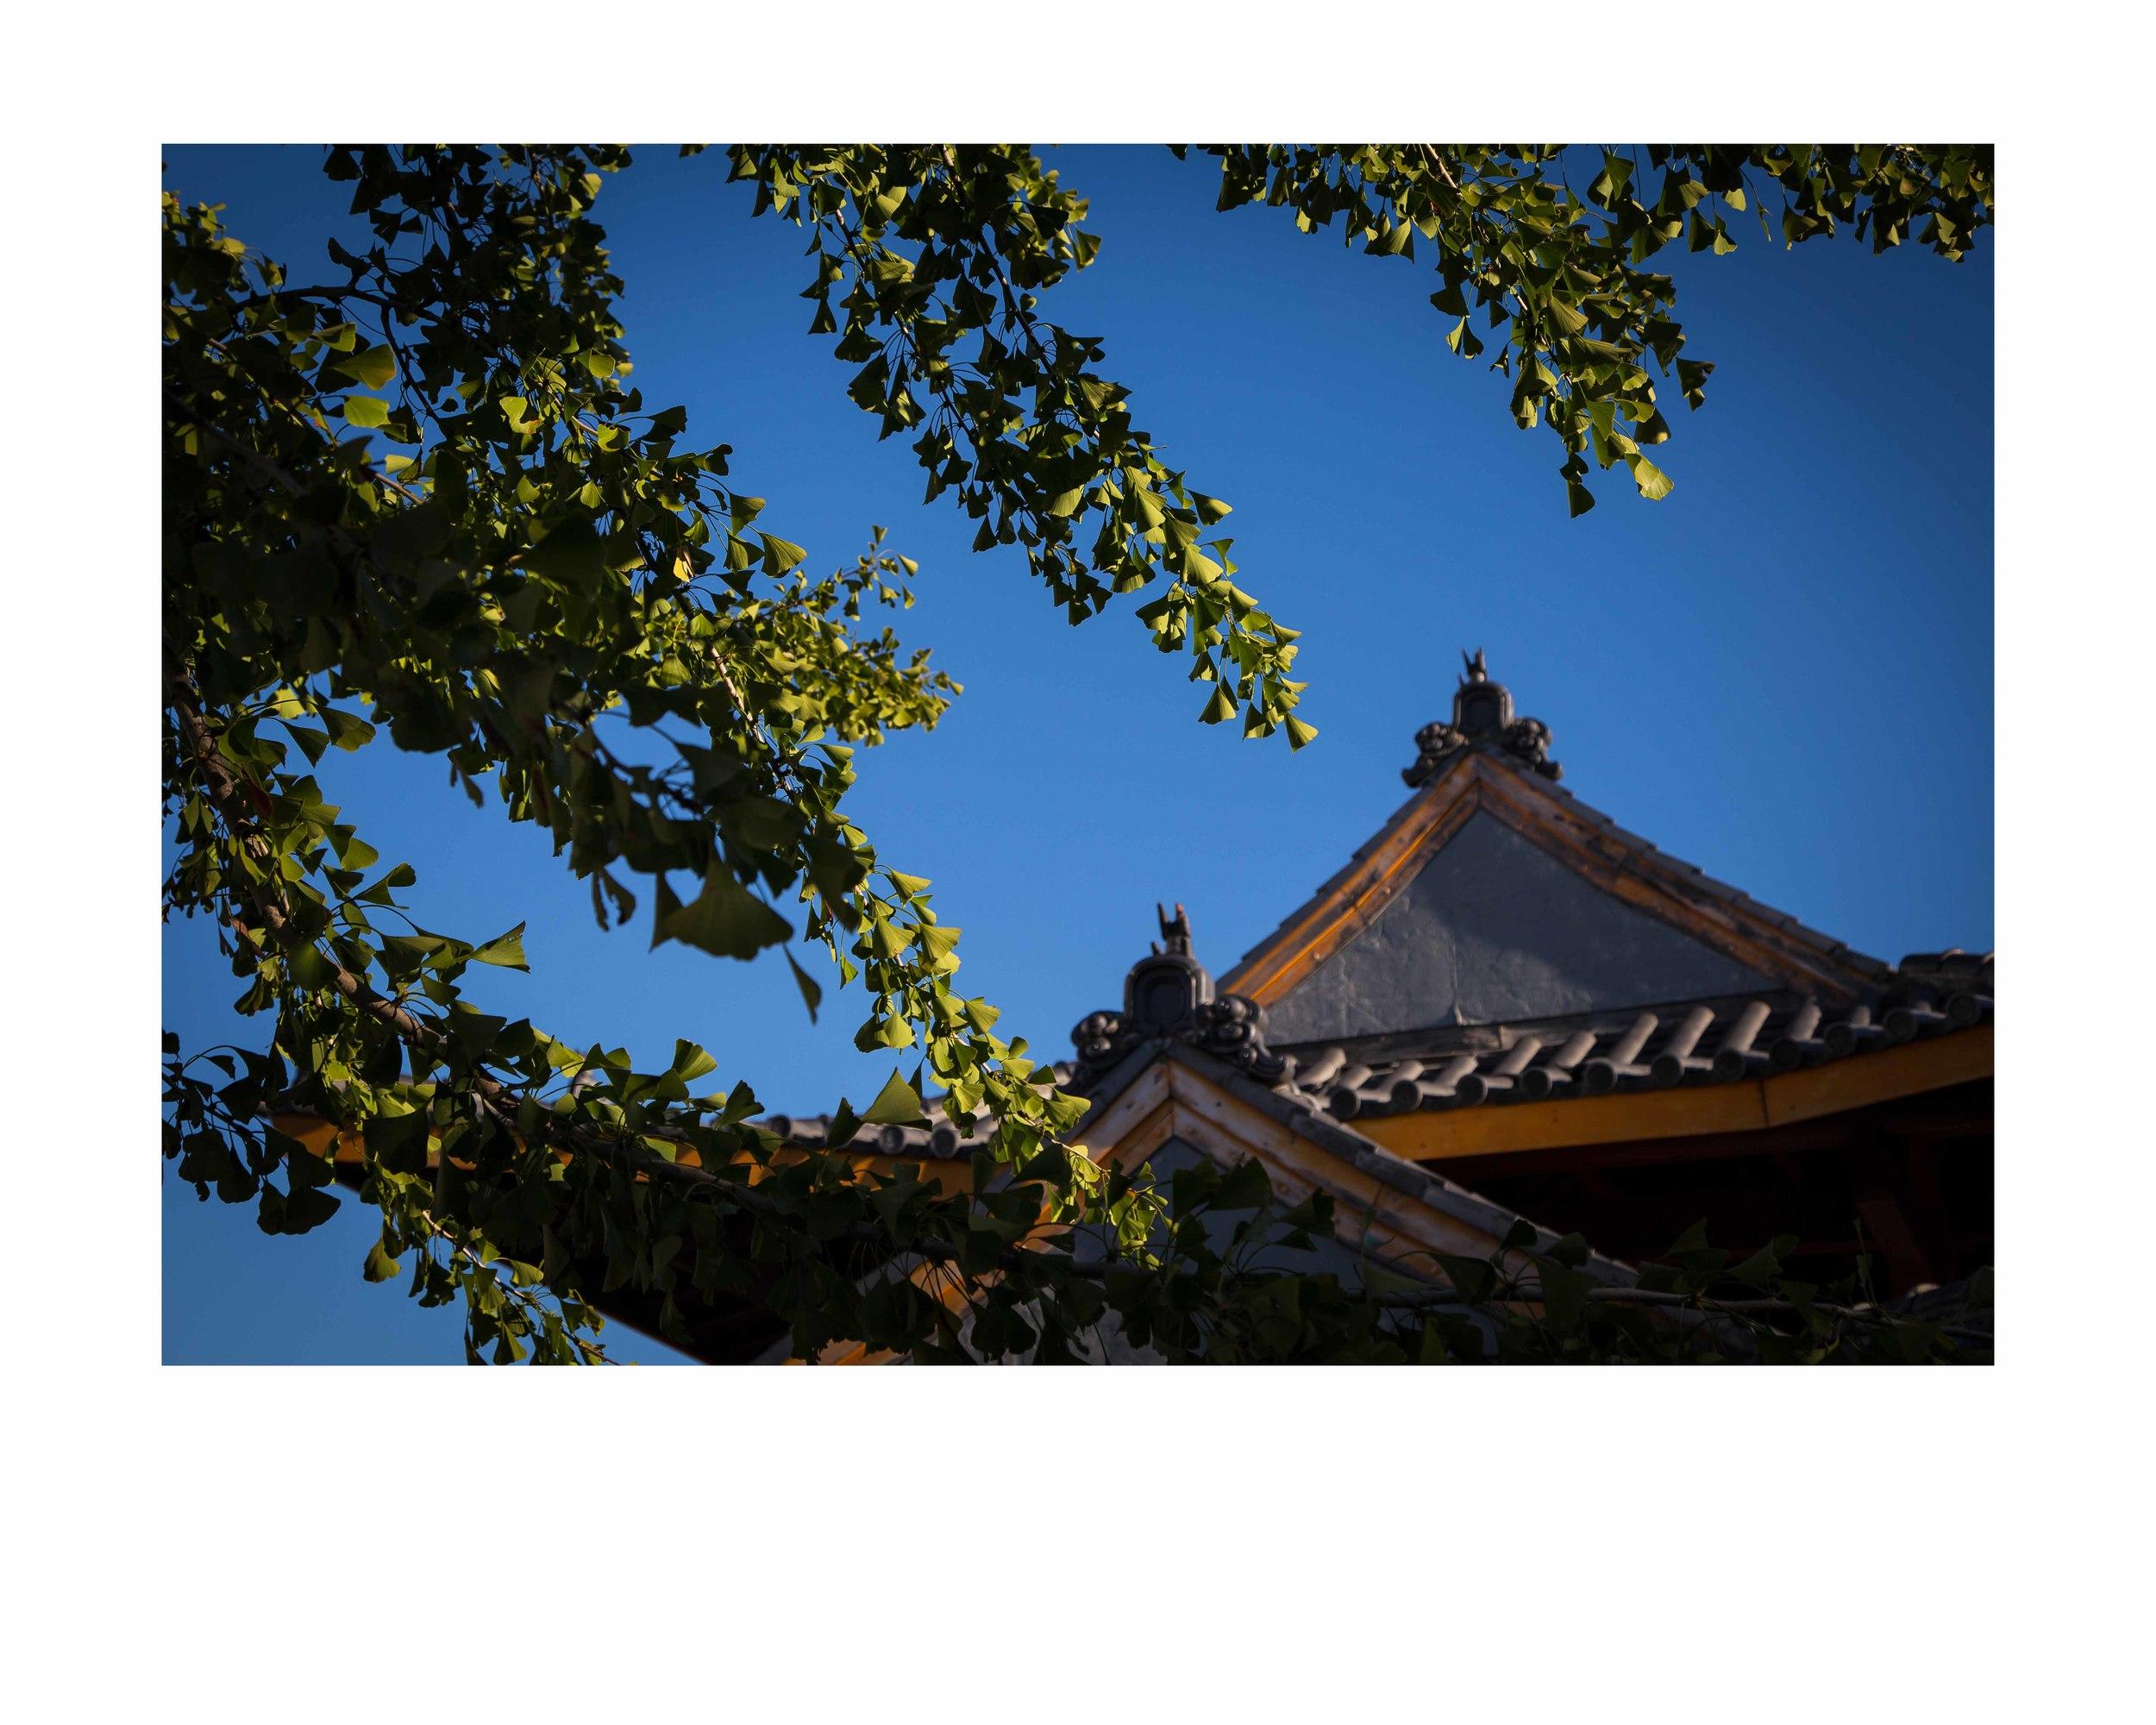 Ping Tom Pagoda.16x20 framed. $150